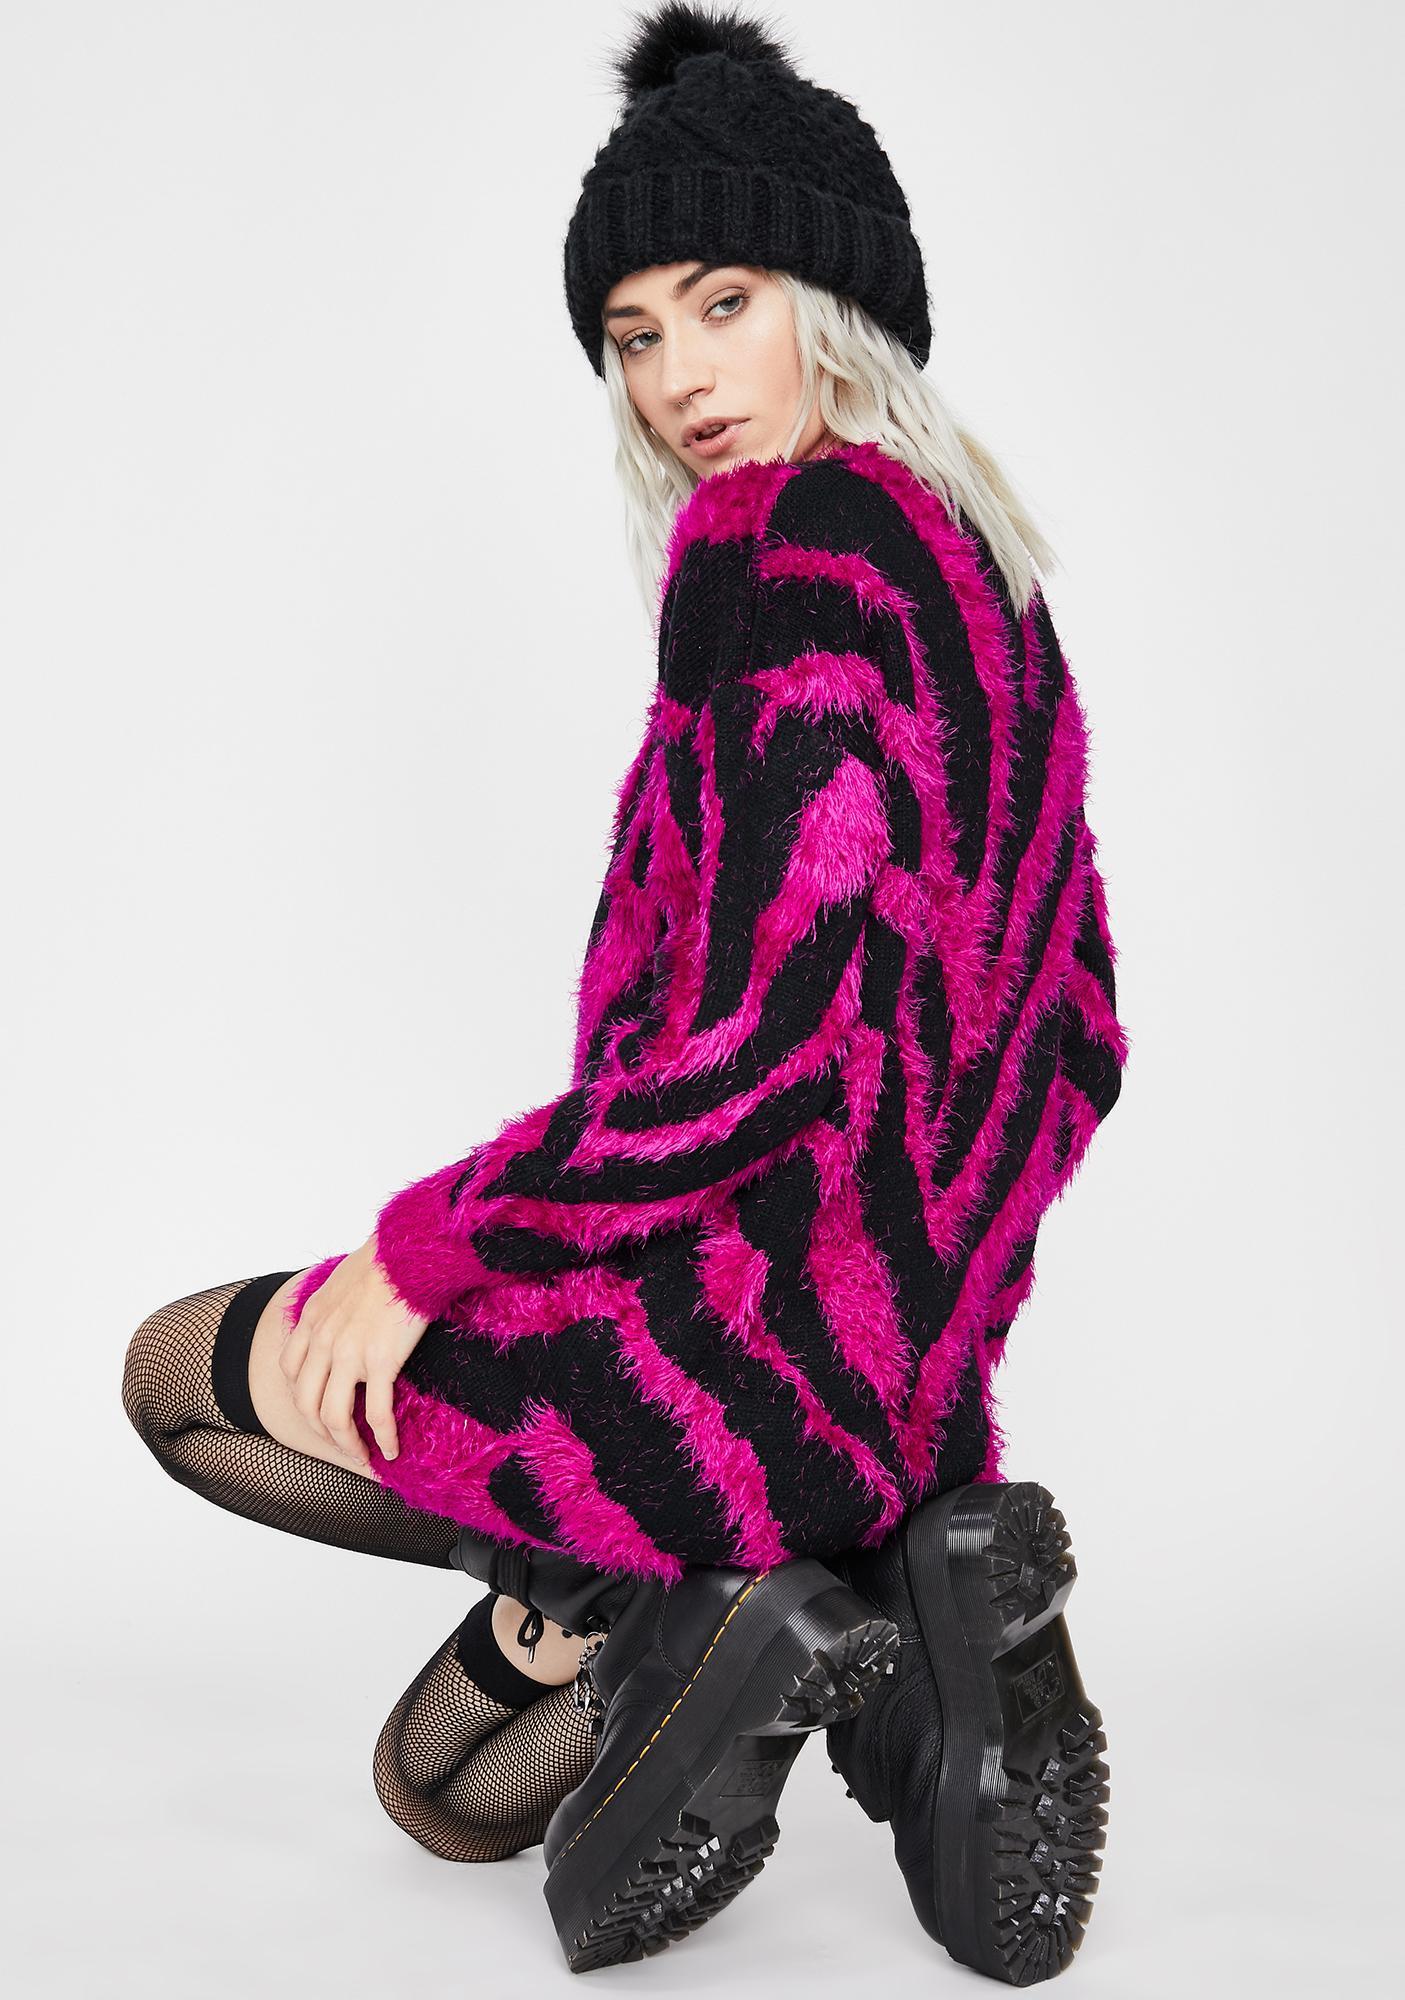 Sweet But Wild Sweater Dress